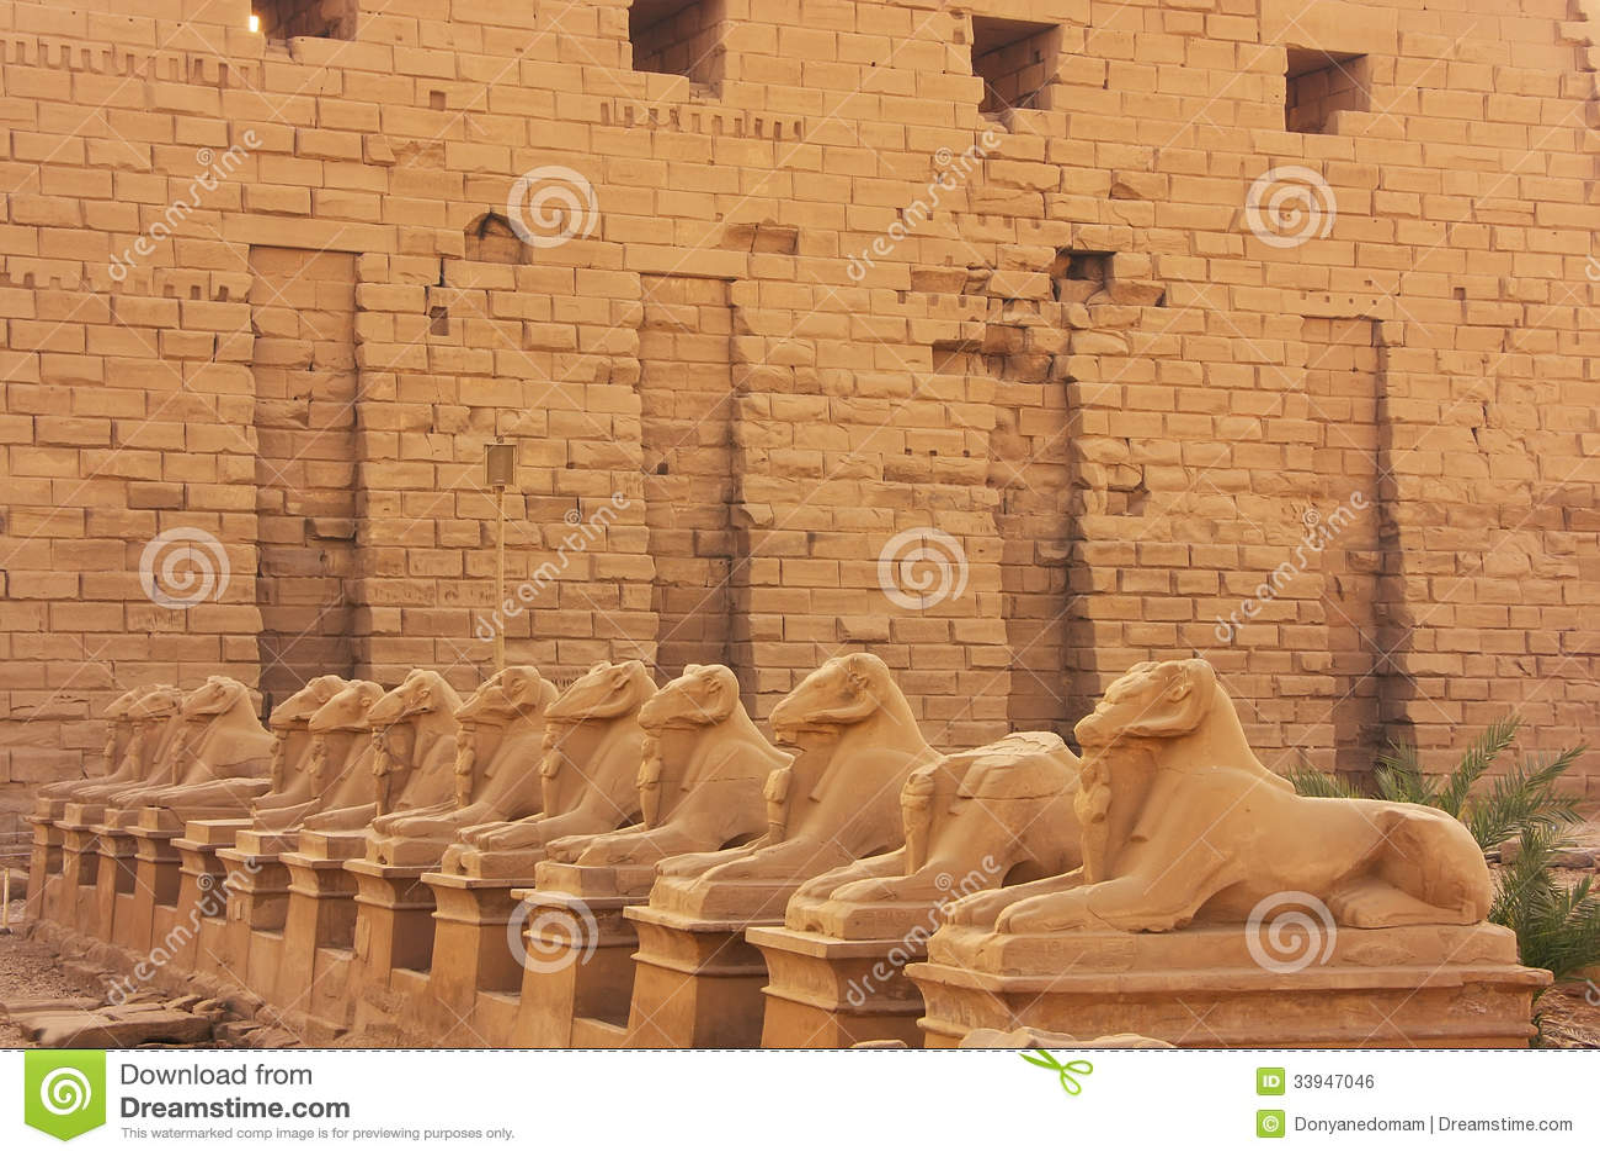 Korytarz Sphynxes, Karnak świątynny kompleks, Luxor